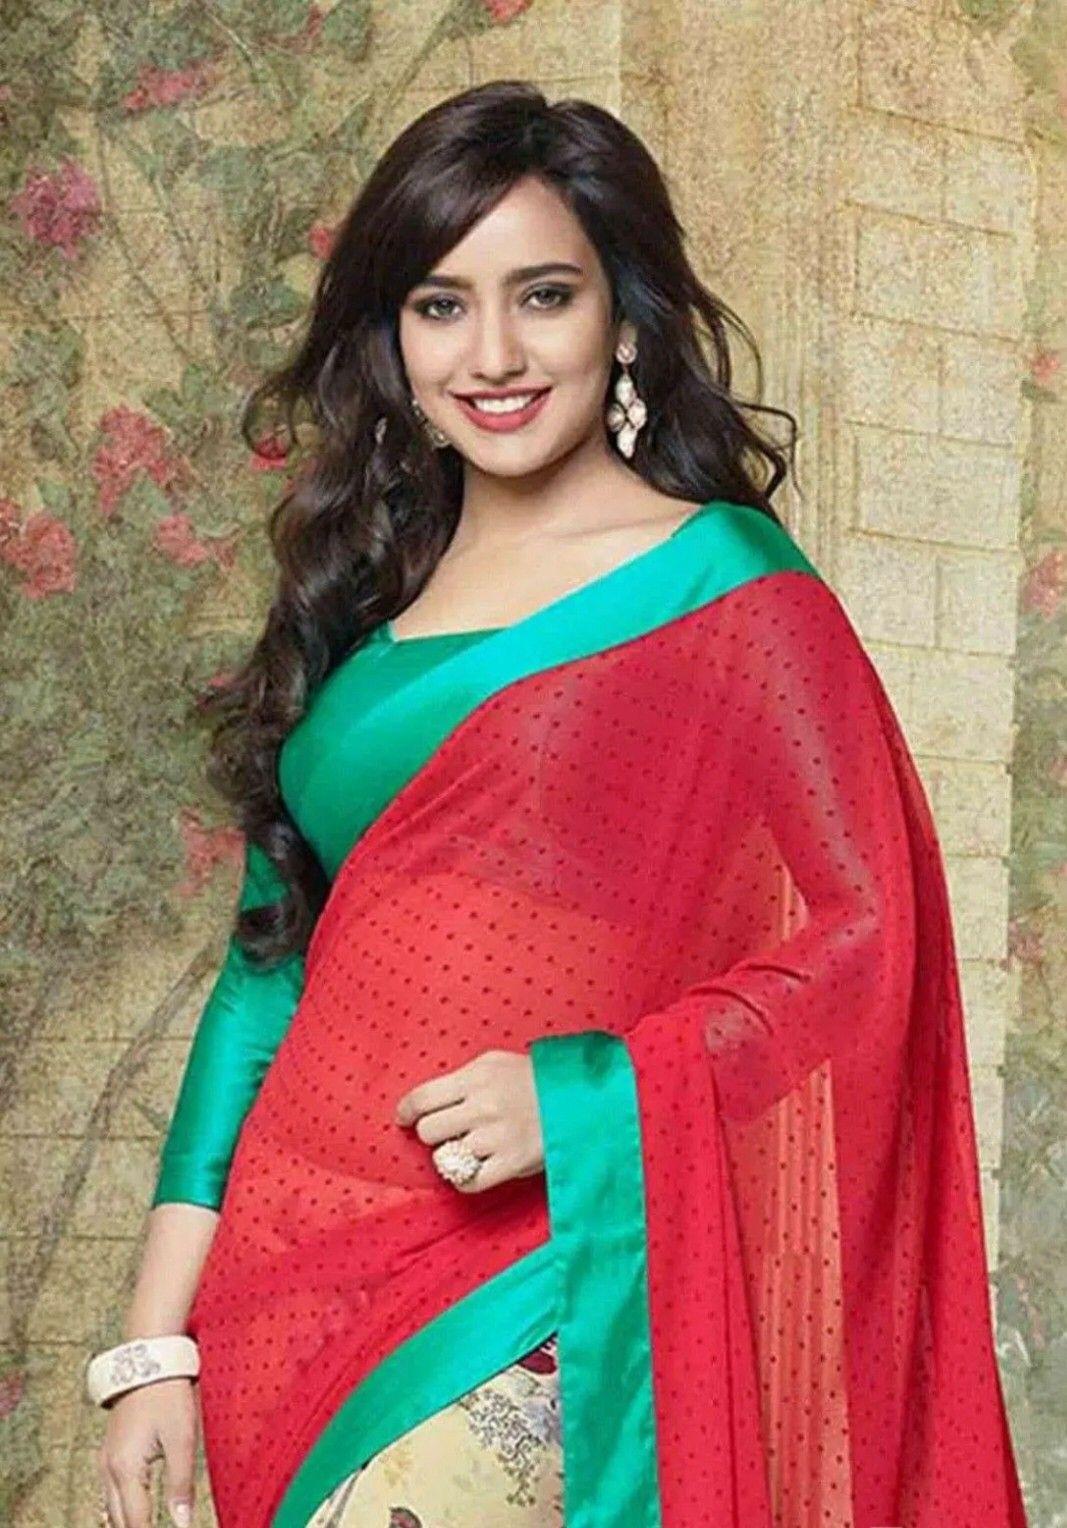 Pin by pradip joshi on India beauty in 2020 Saree